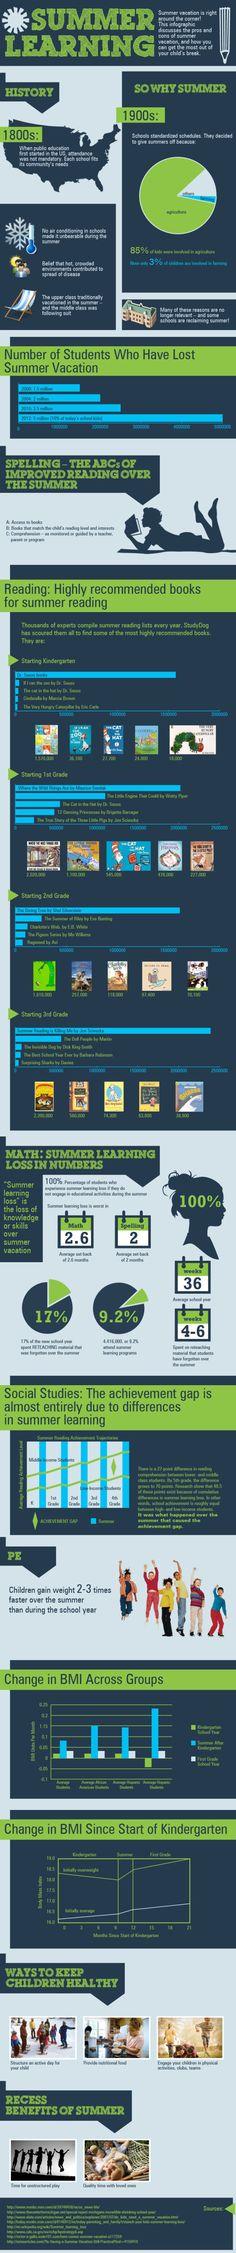 Summer Learning - infographic via edudemic